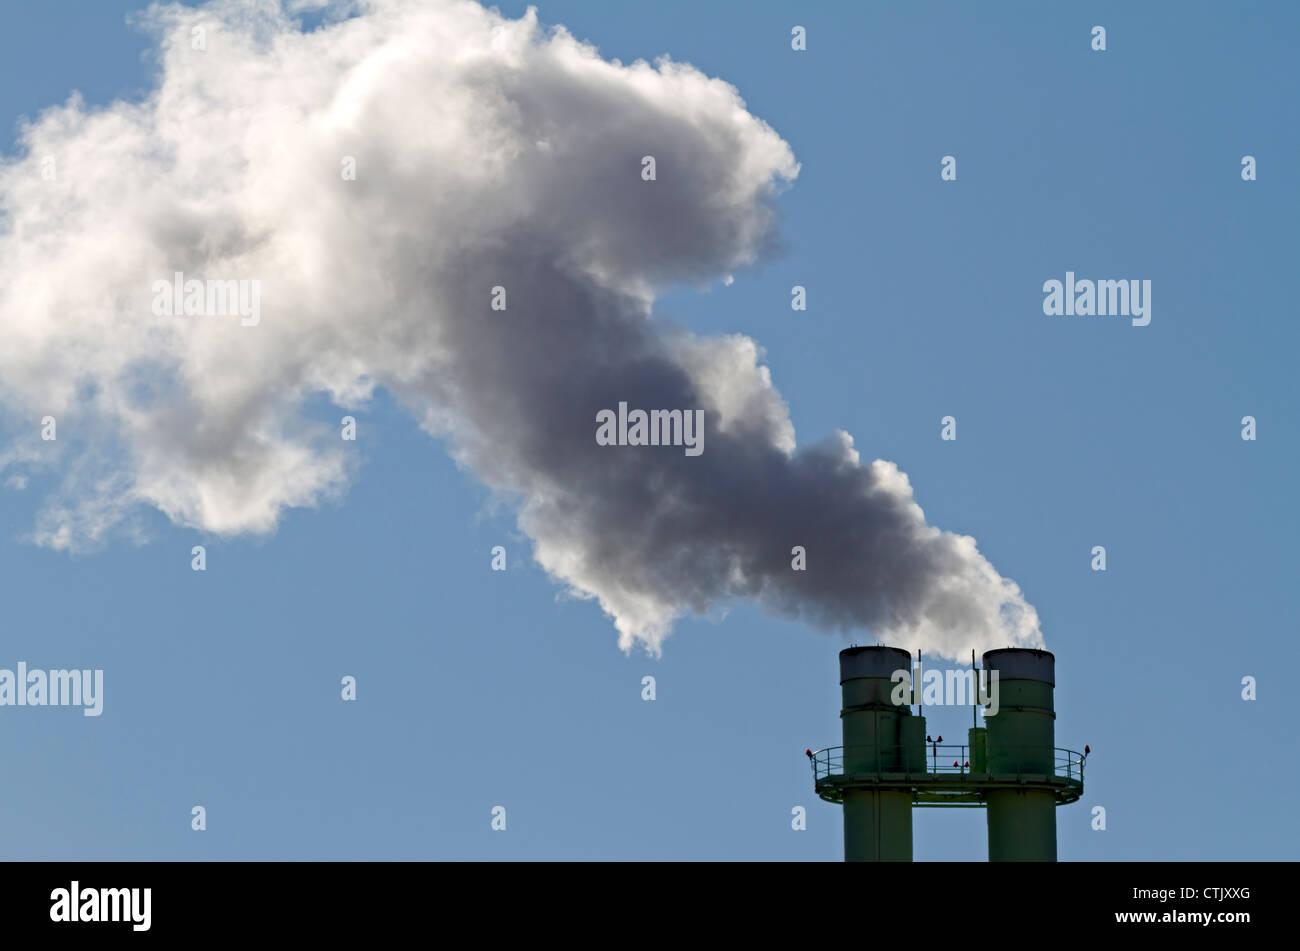 Smoking chimney - Stock Image